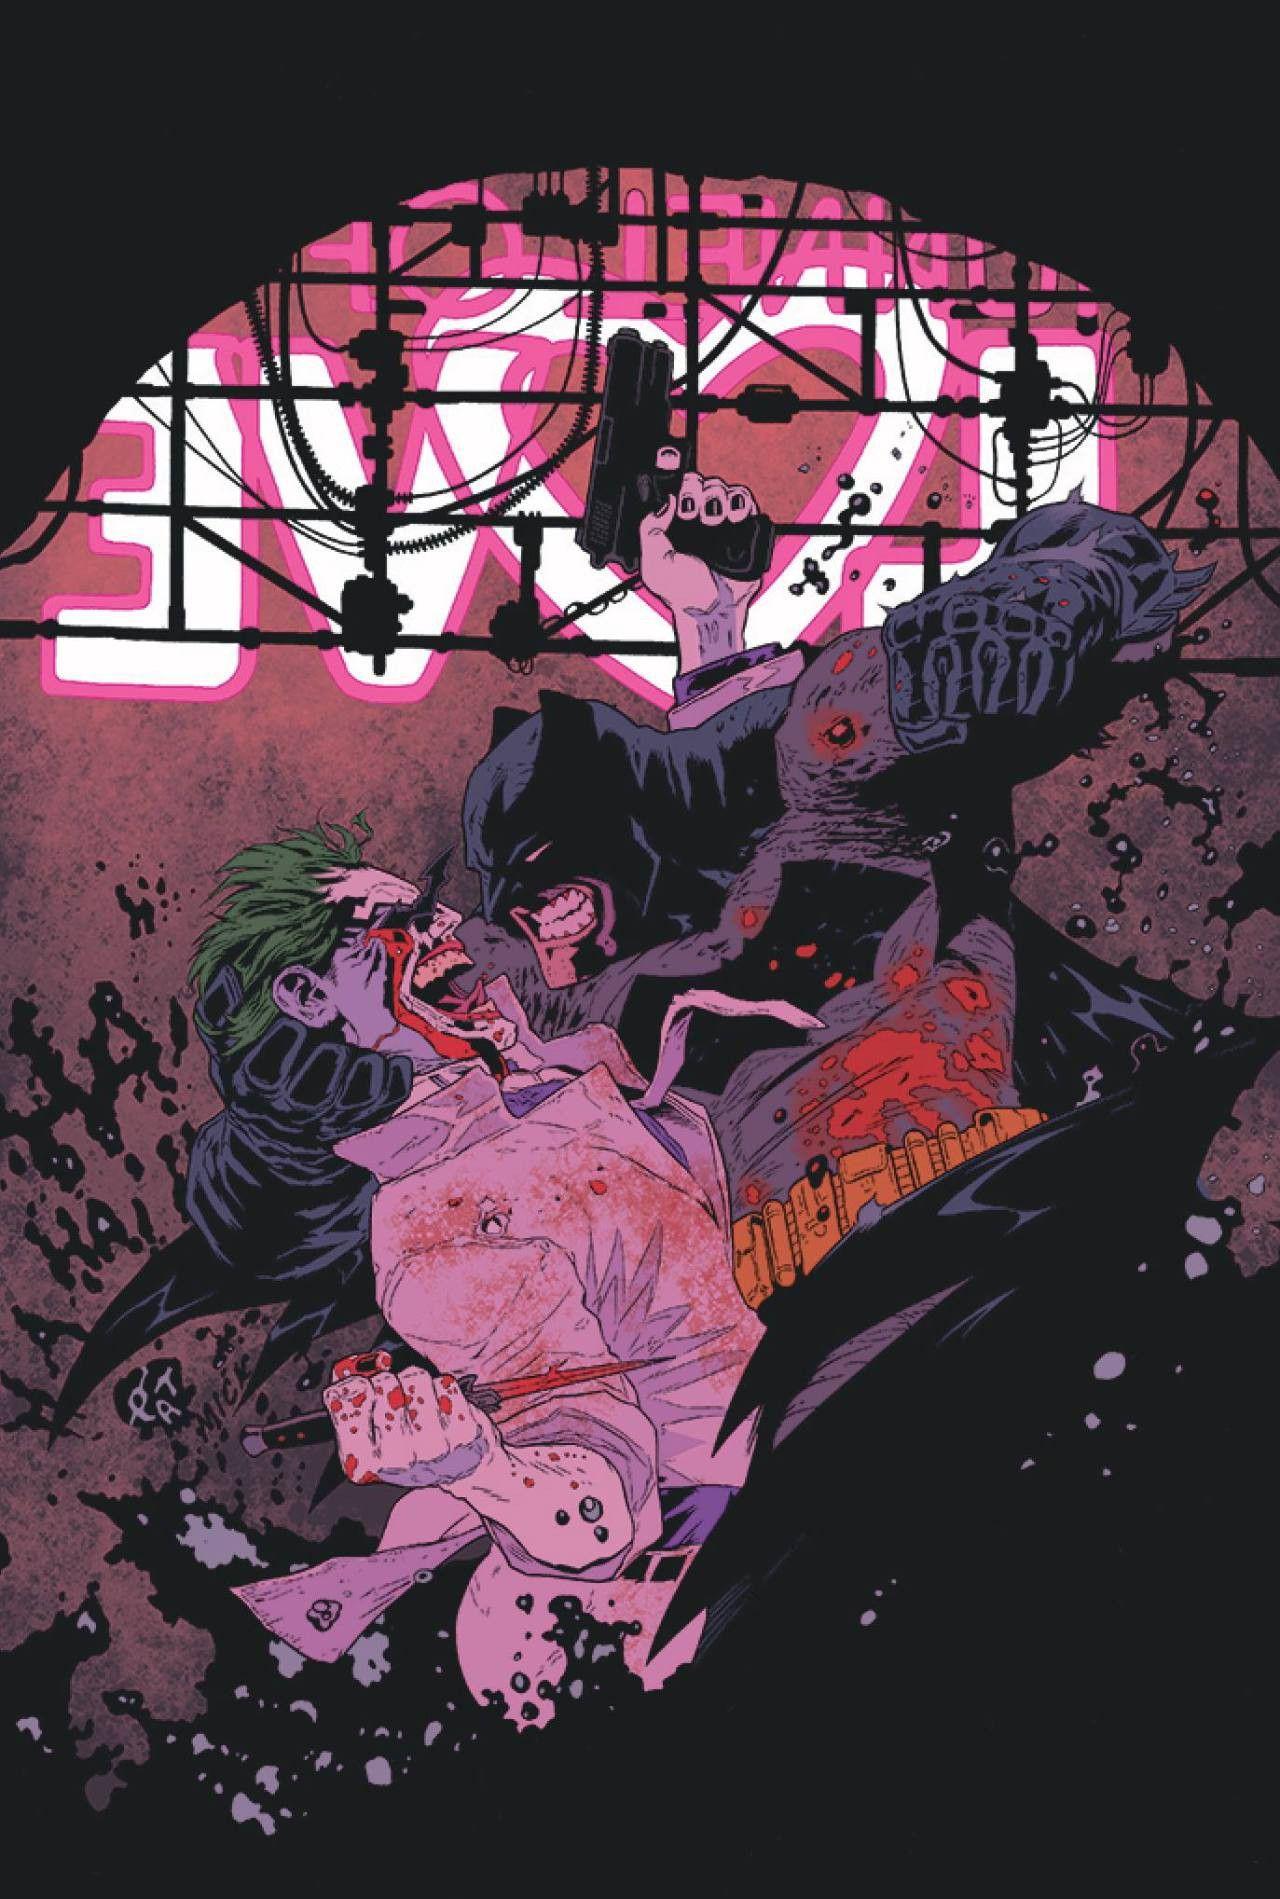 Pin by anthony noneya on dc stuff 2 | Joker comic, Batman ...